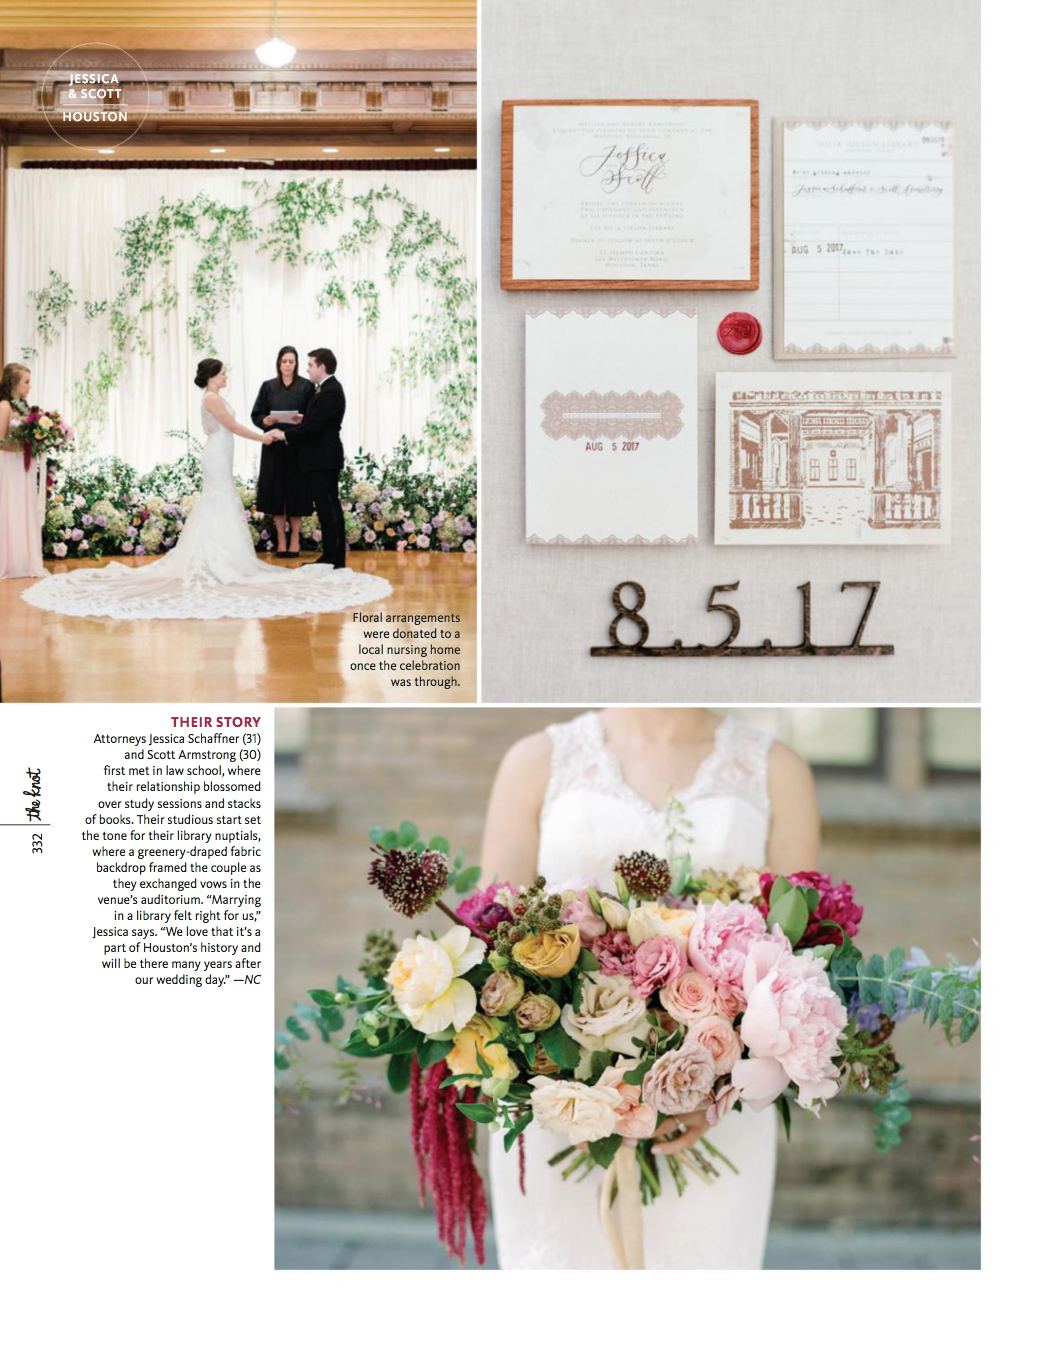 The-Knot-Texas-Fine-Art-Wedding-Film-Destination-Photographer-Houston-Austin-Dallas-New-Orleans-Julia-Ideson-Library-Event-Dana-Josh-Fernandez-Photograph-Top-Best-32.png